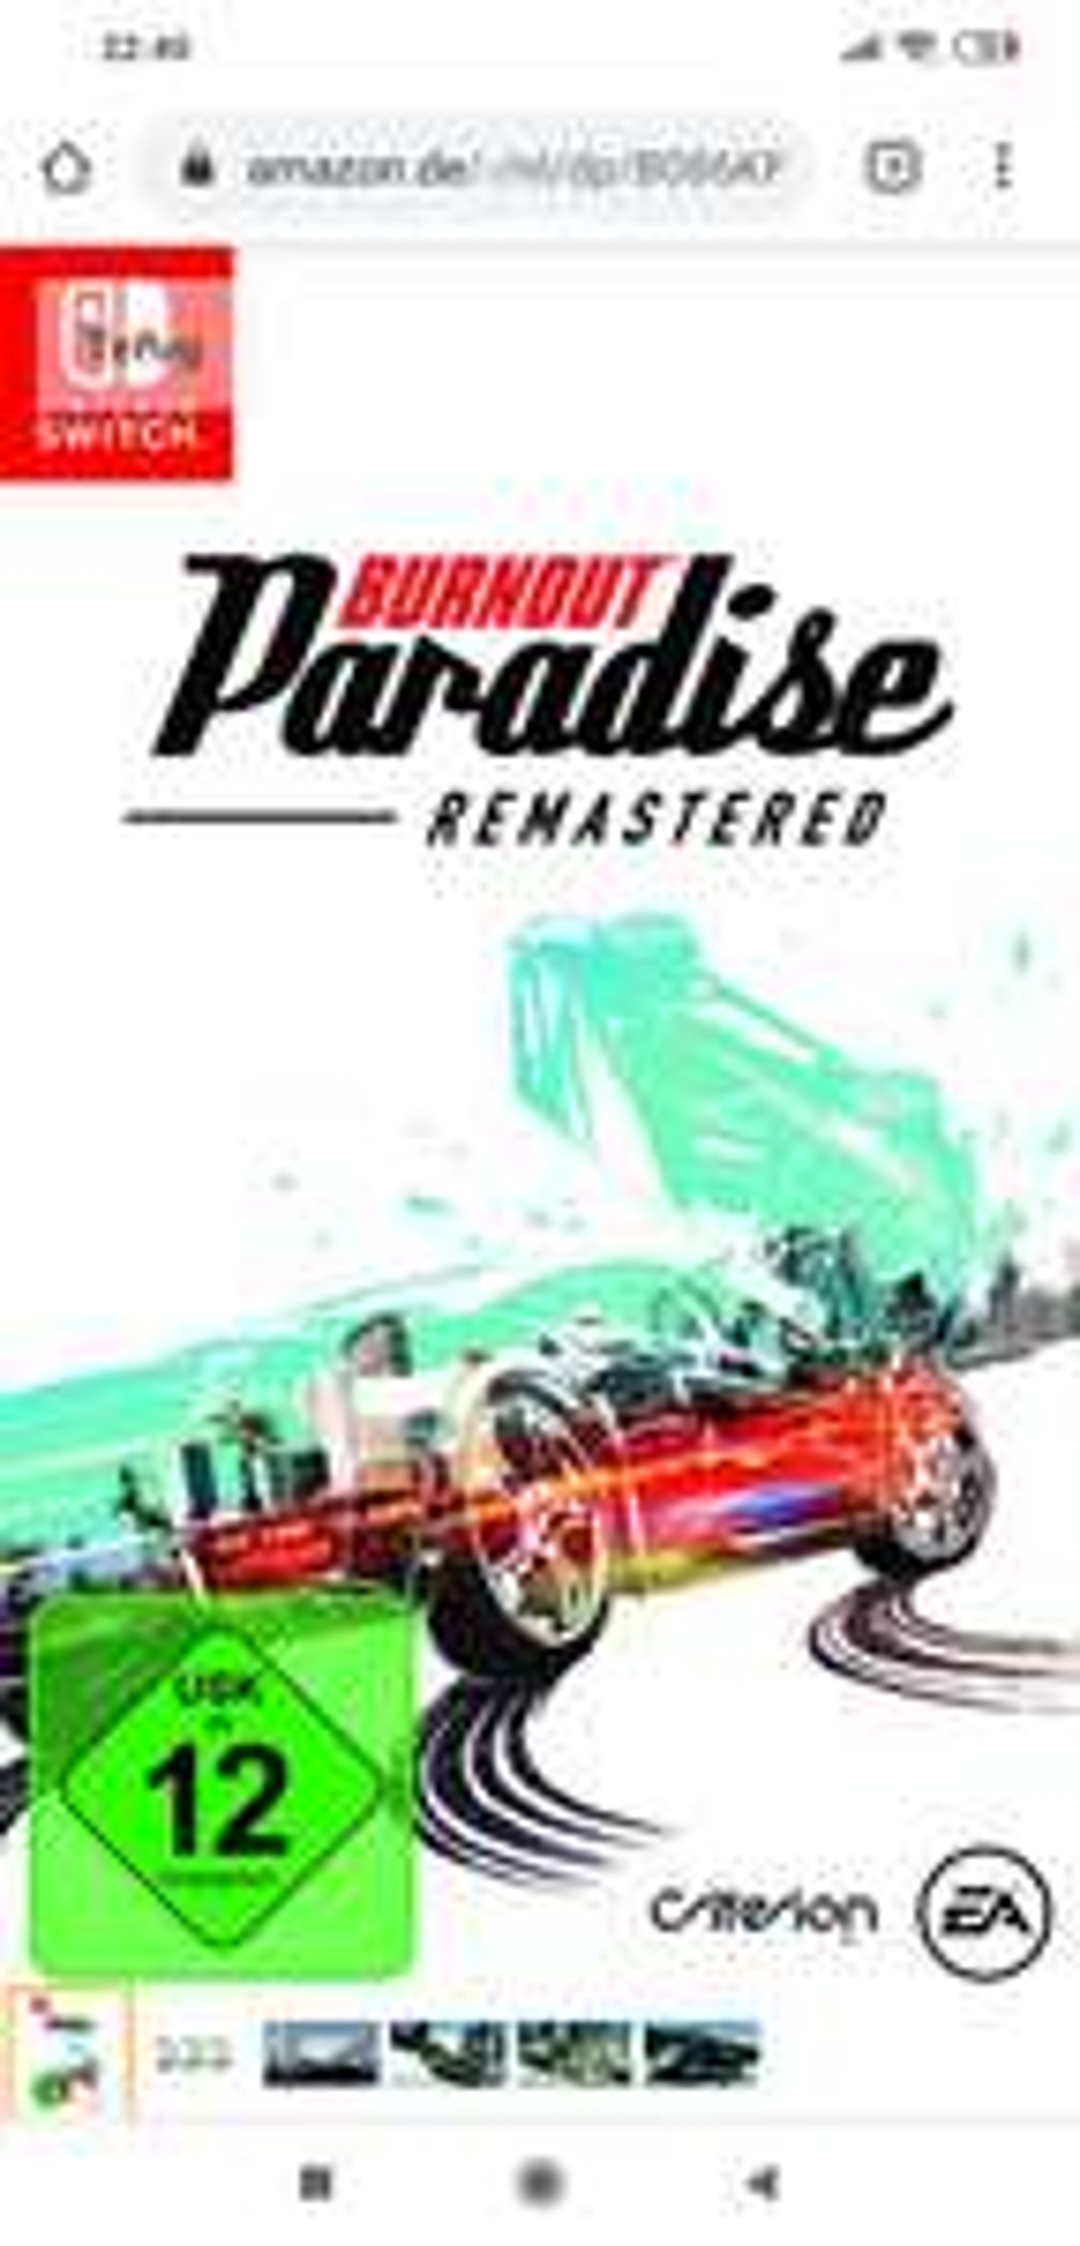 (Switch) Burnout paradise remasterd